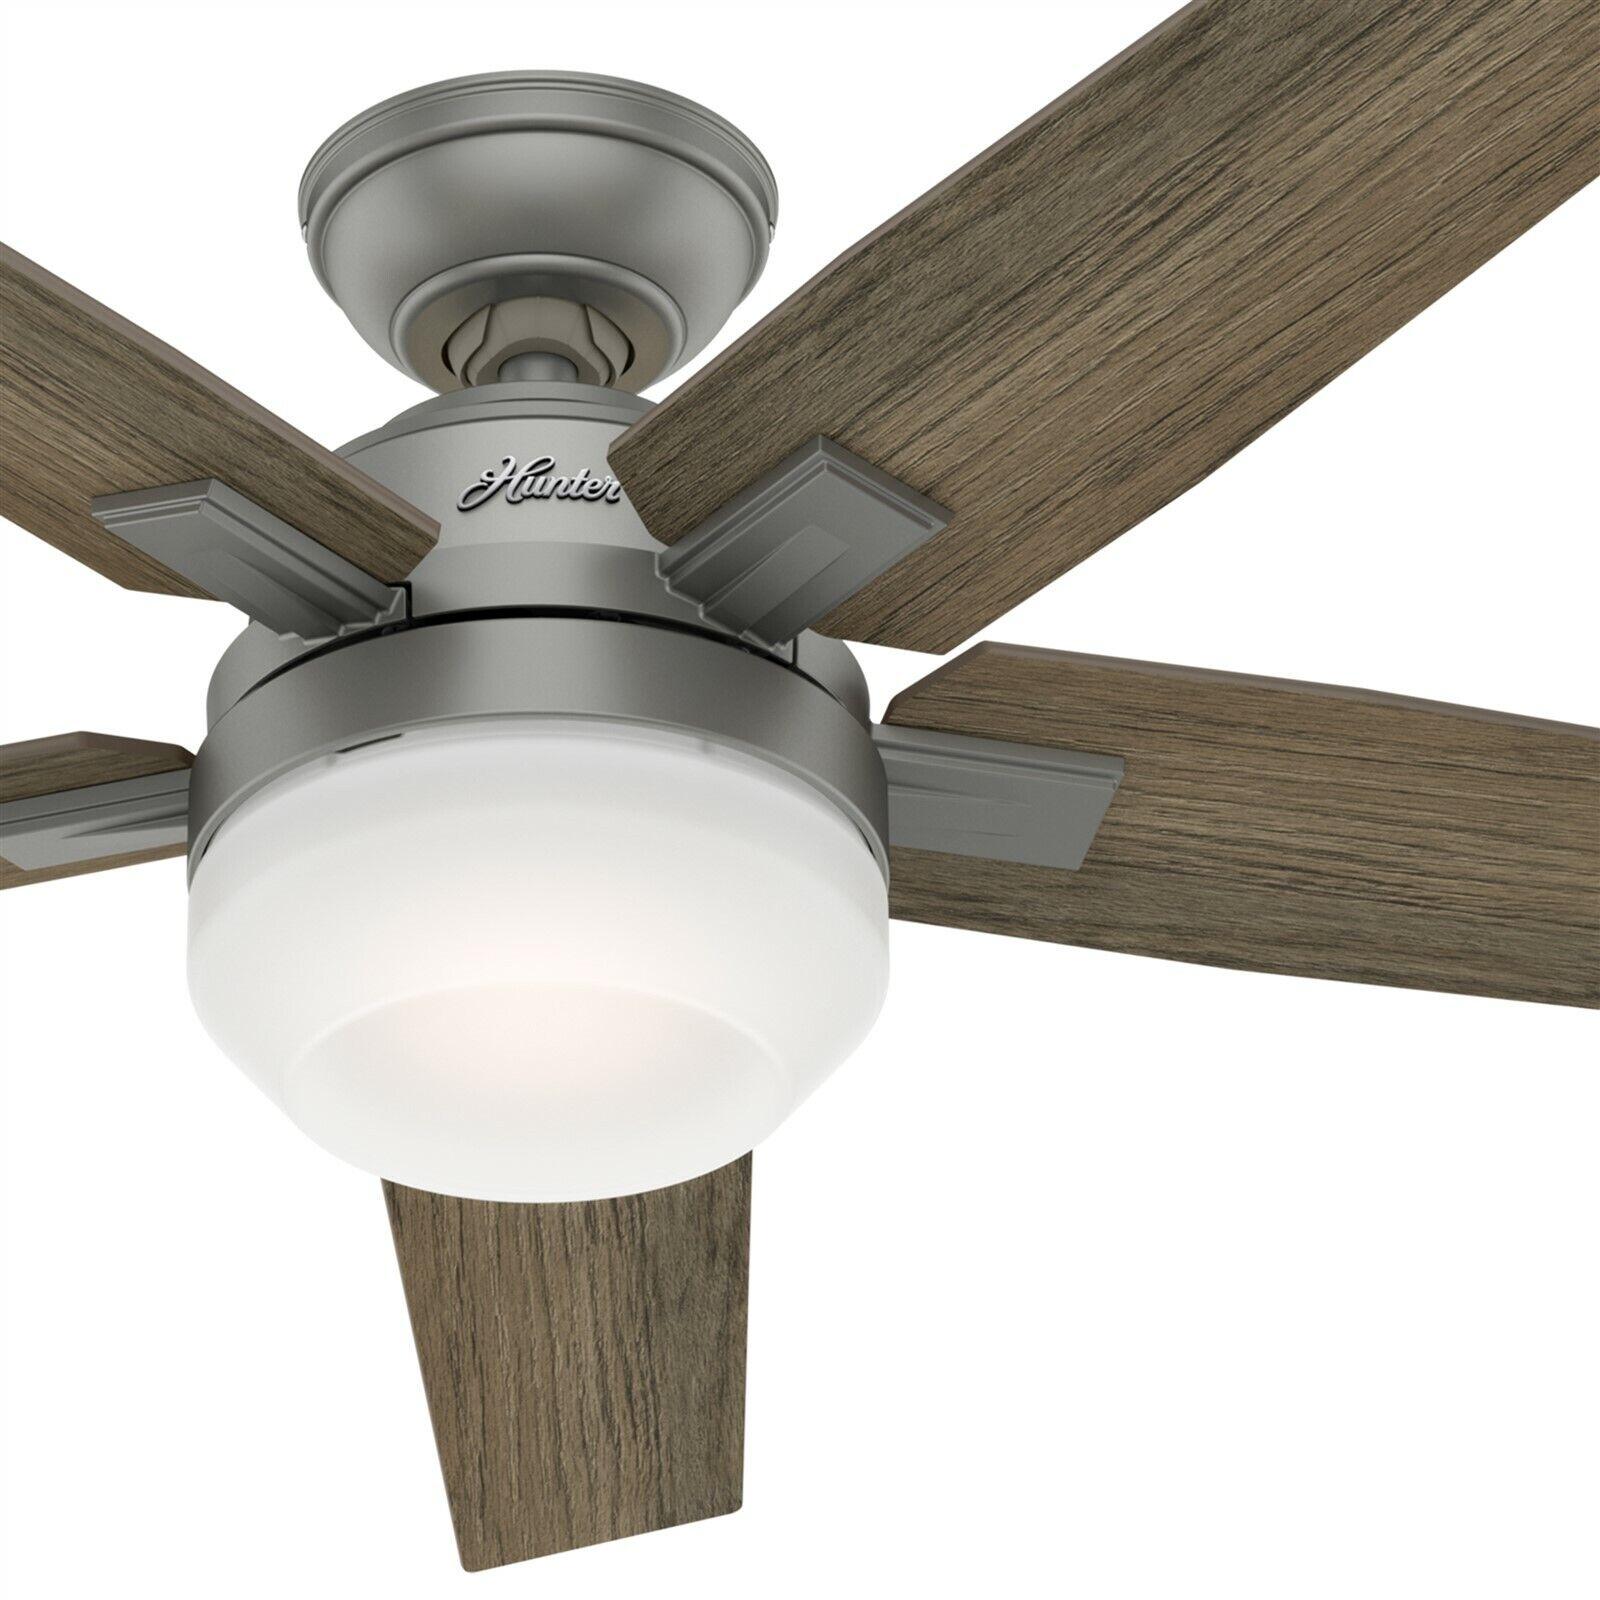 Hunter 54015 Tuscan Gold Ceiling Fan 52 Inch For Sale Online Ebay